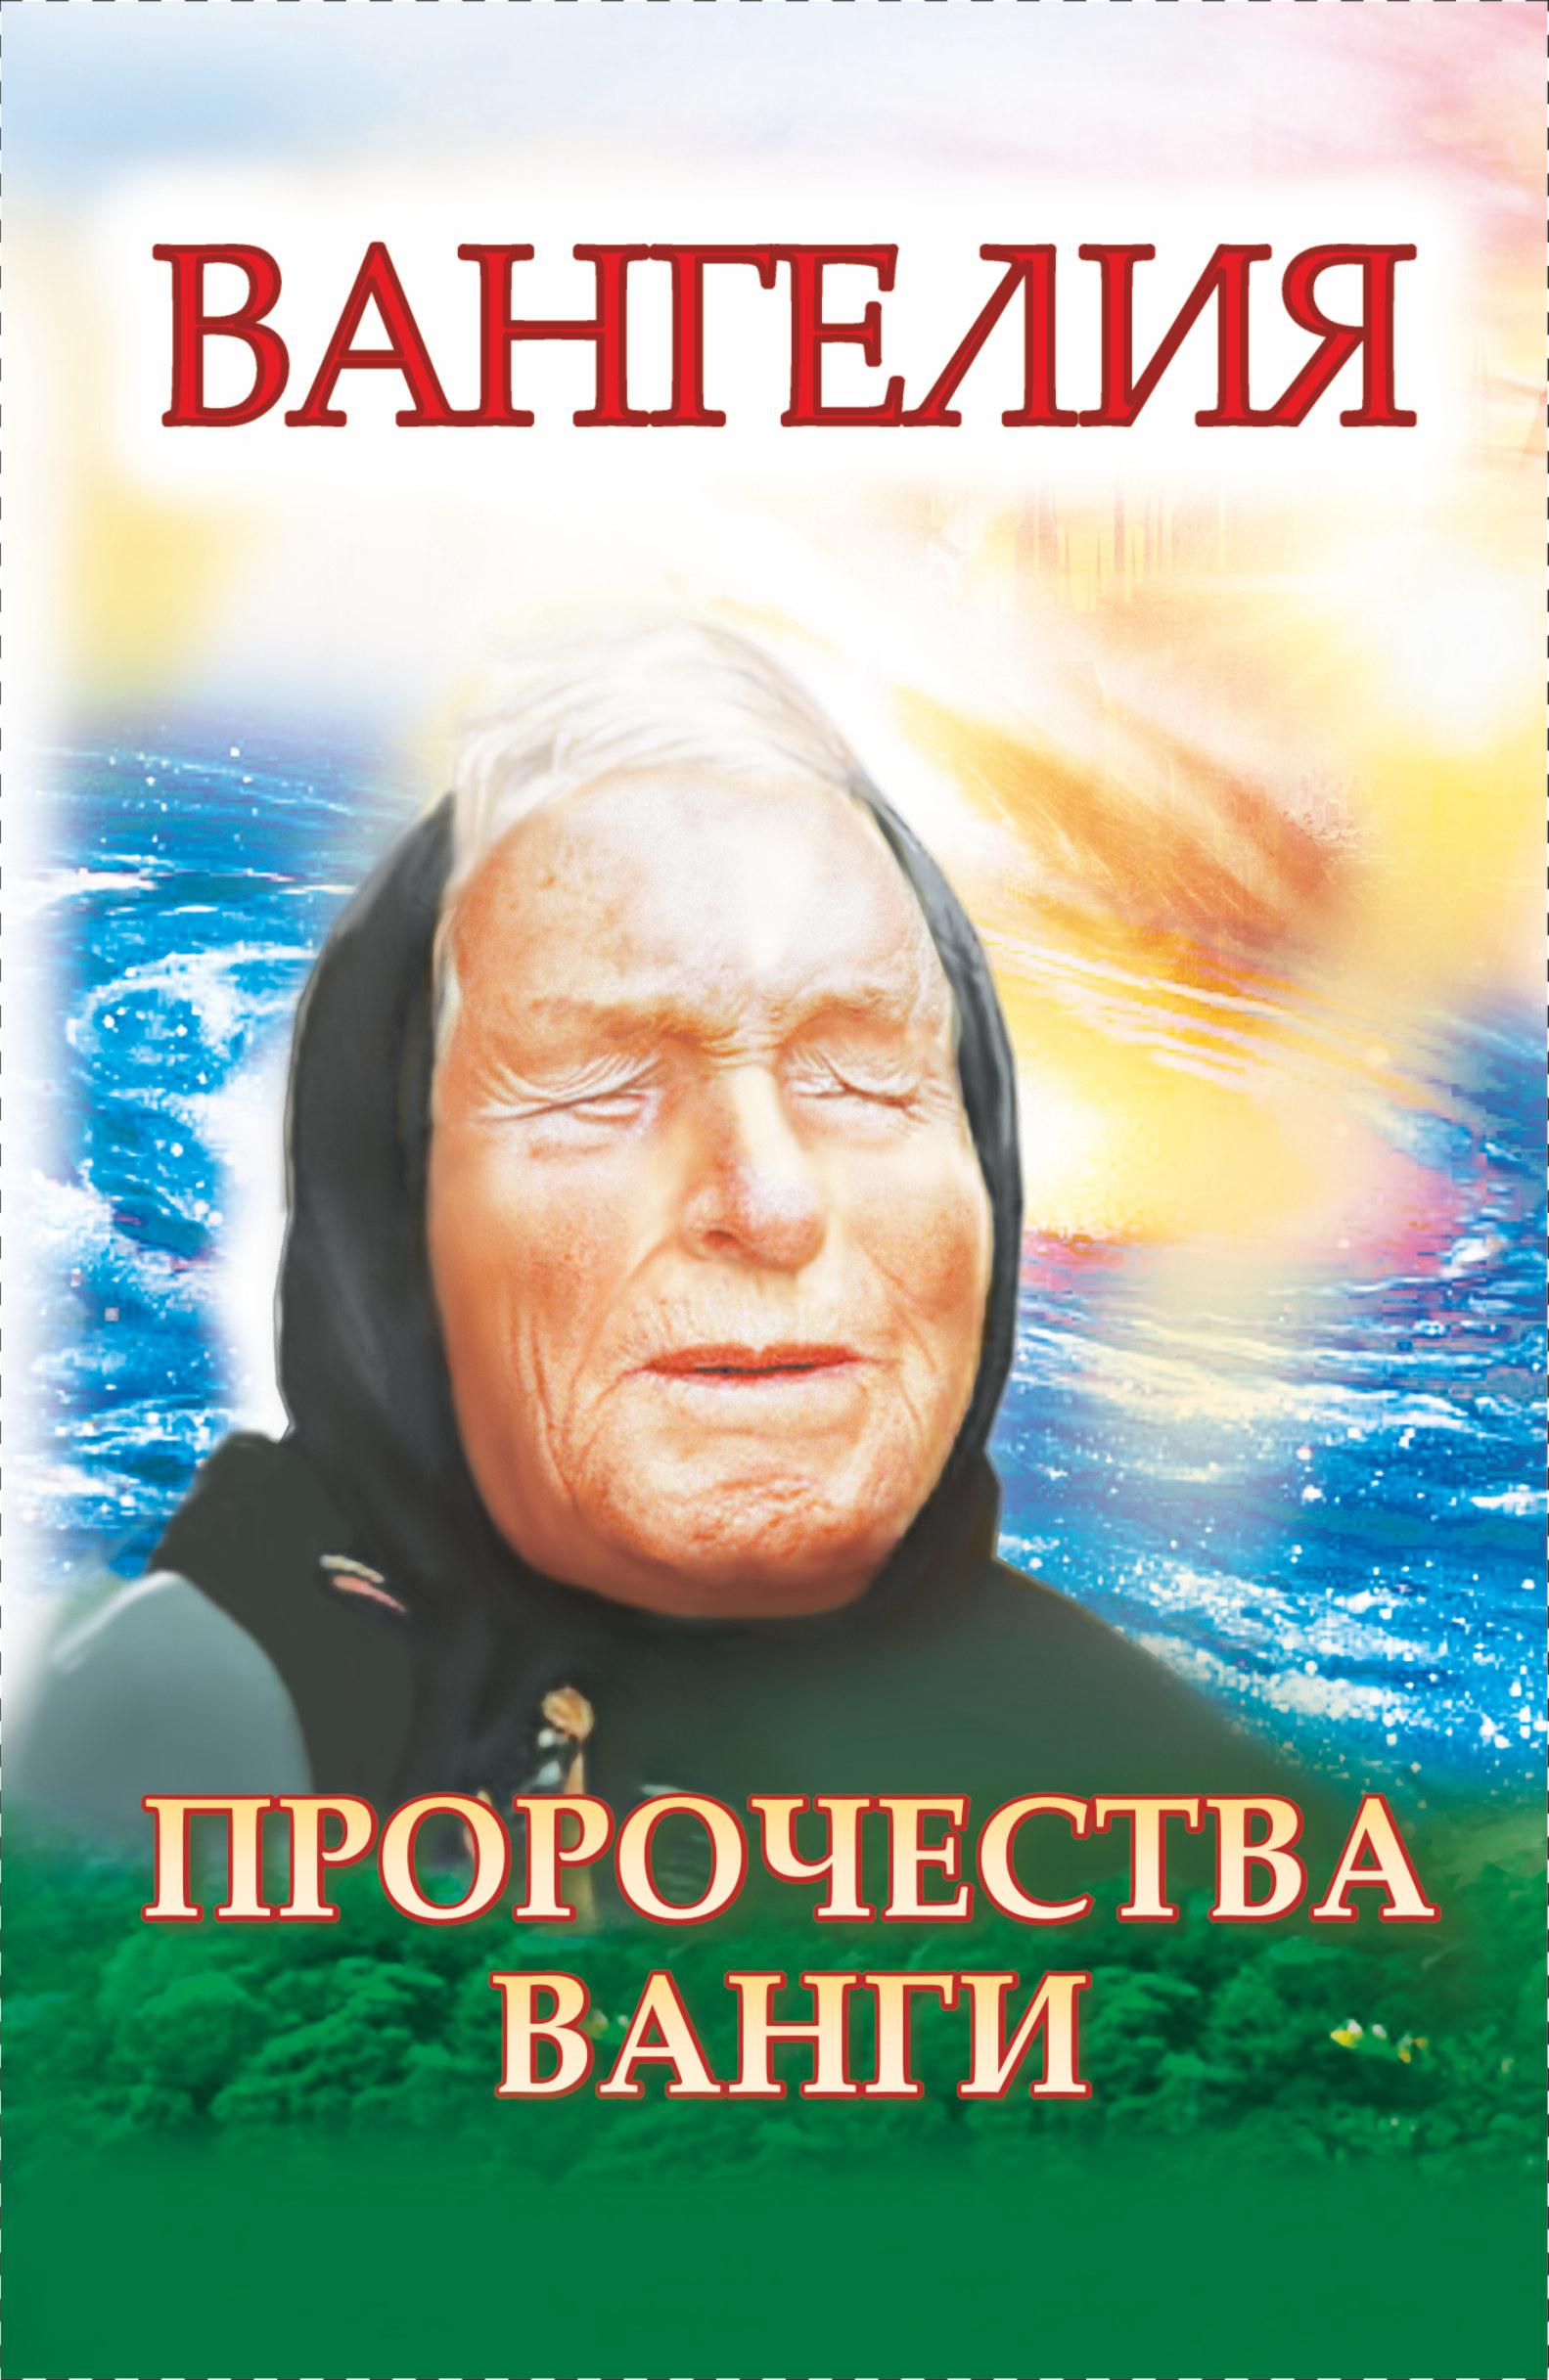 Хамидова В.Р. Вангелия. Пророчества Ванги пророчества ванги